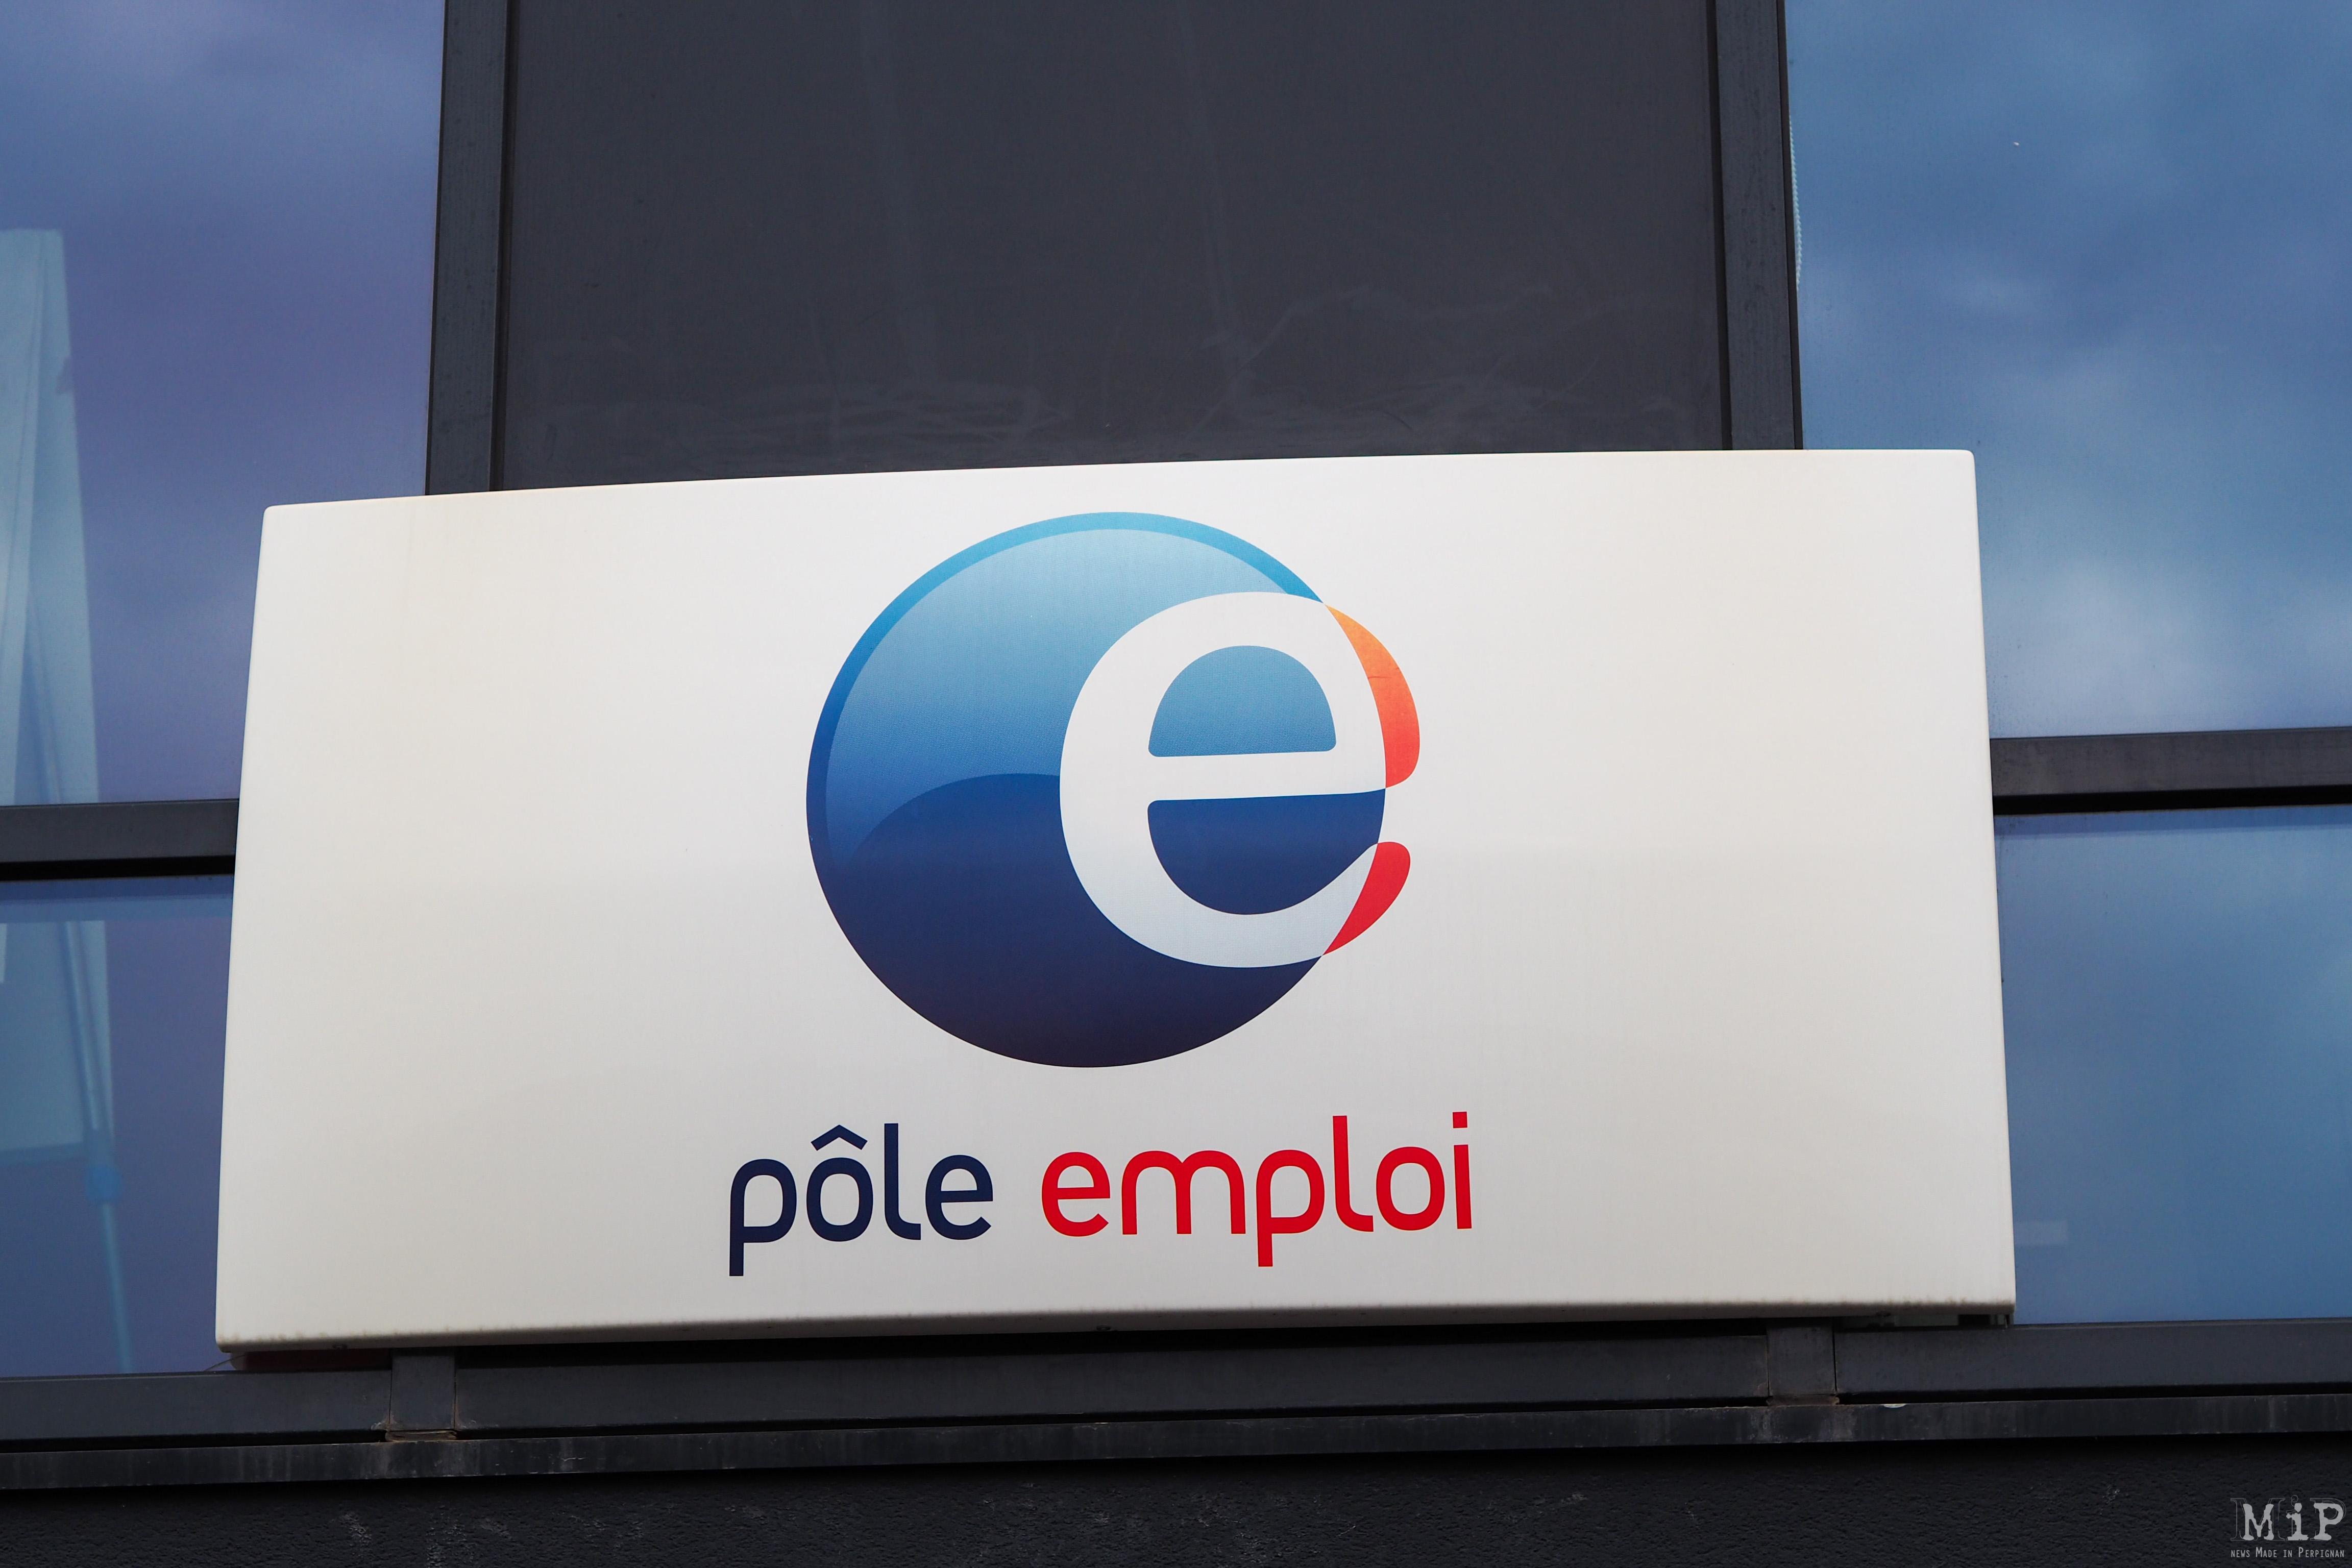 Pole emploi - Pyrénées-Orientales